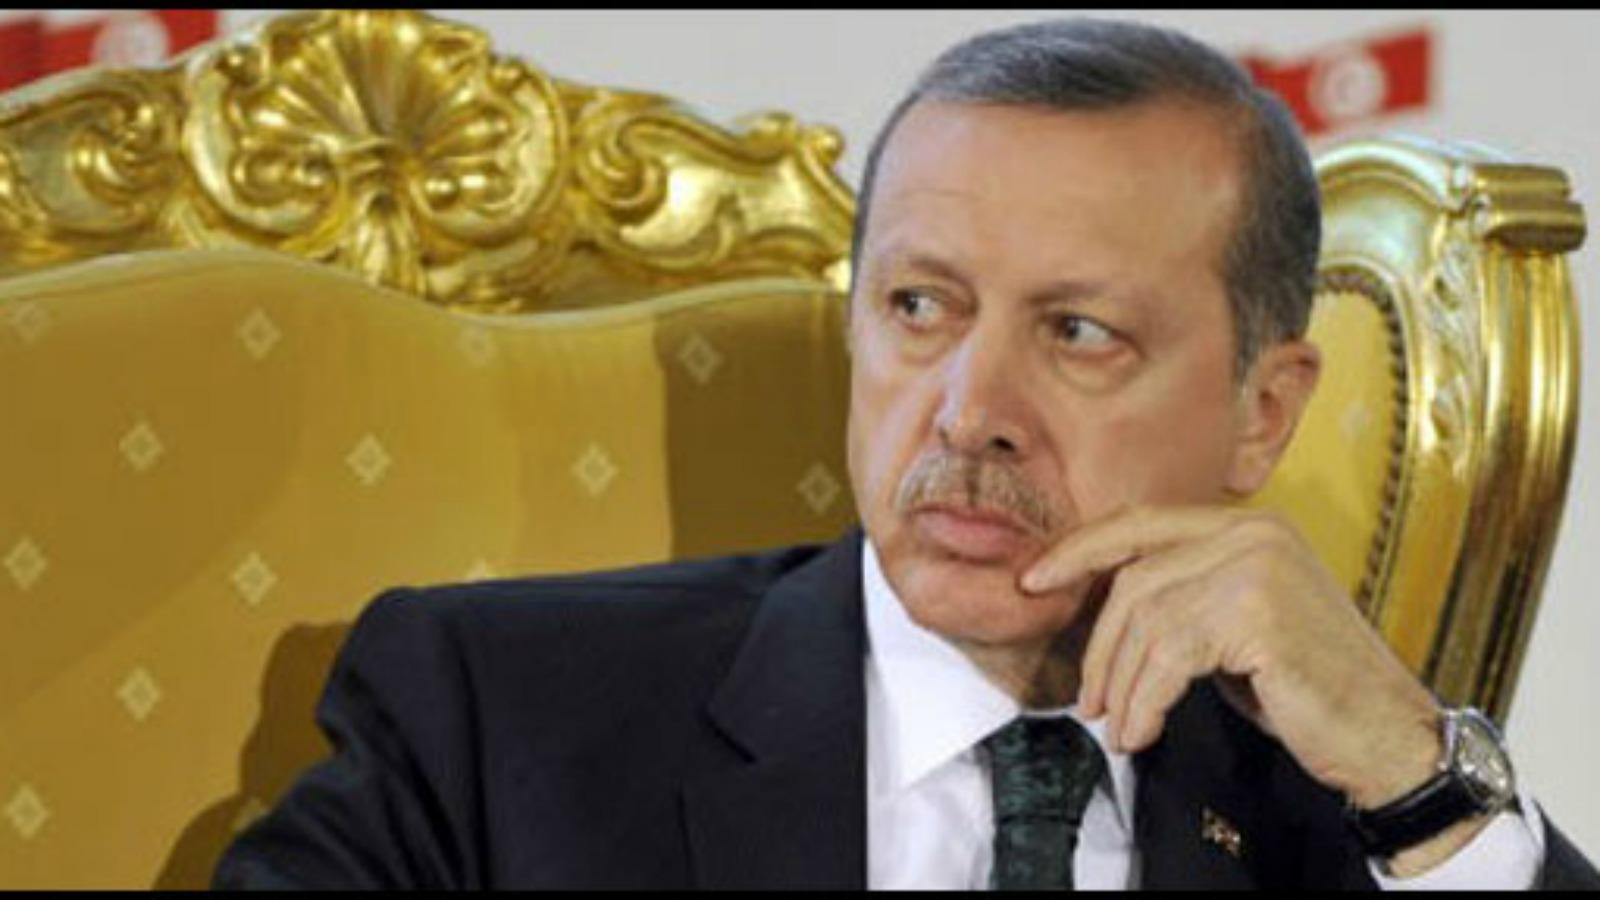 Nazi-Vergleich, Wahlkampf-Auftritt, Islam, Türkei, EU-Beitritt, Erdogan, Türkei-EU-Bericht,